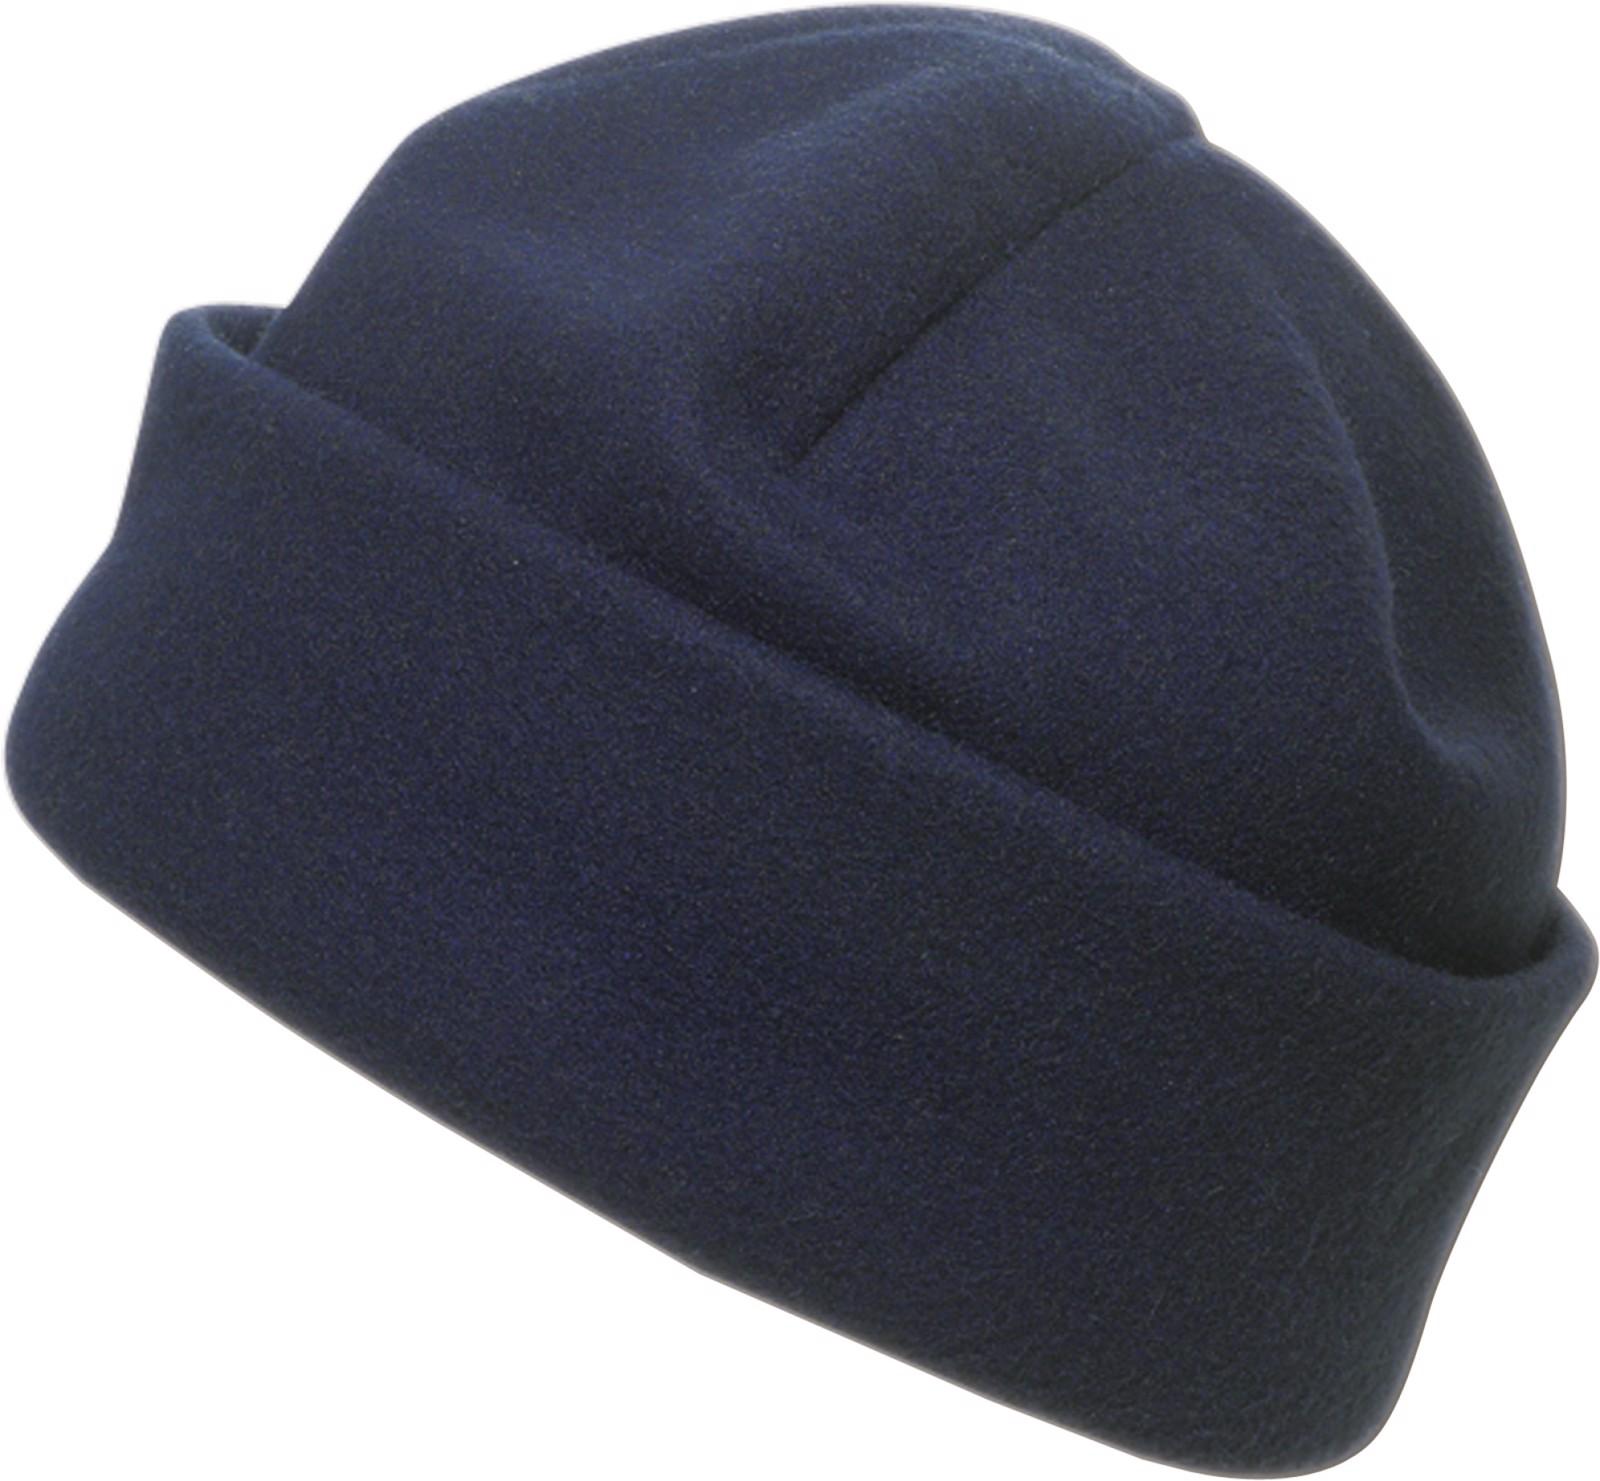 Polyester fleece (200 gr/m²) beanie - Blue